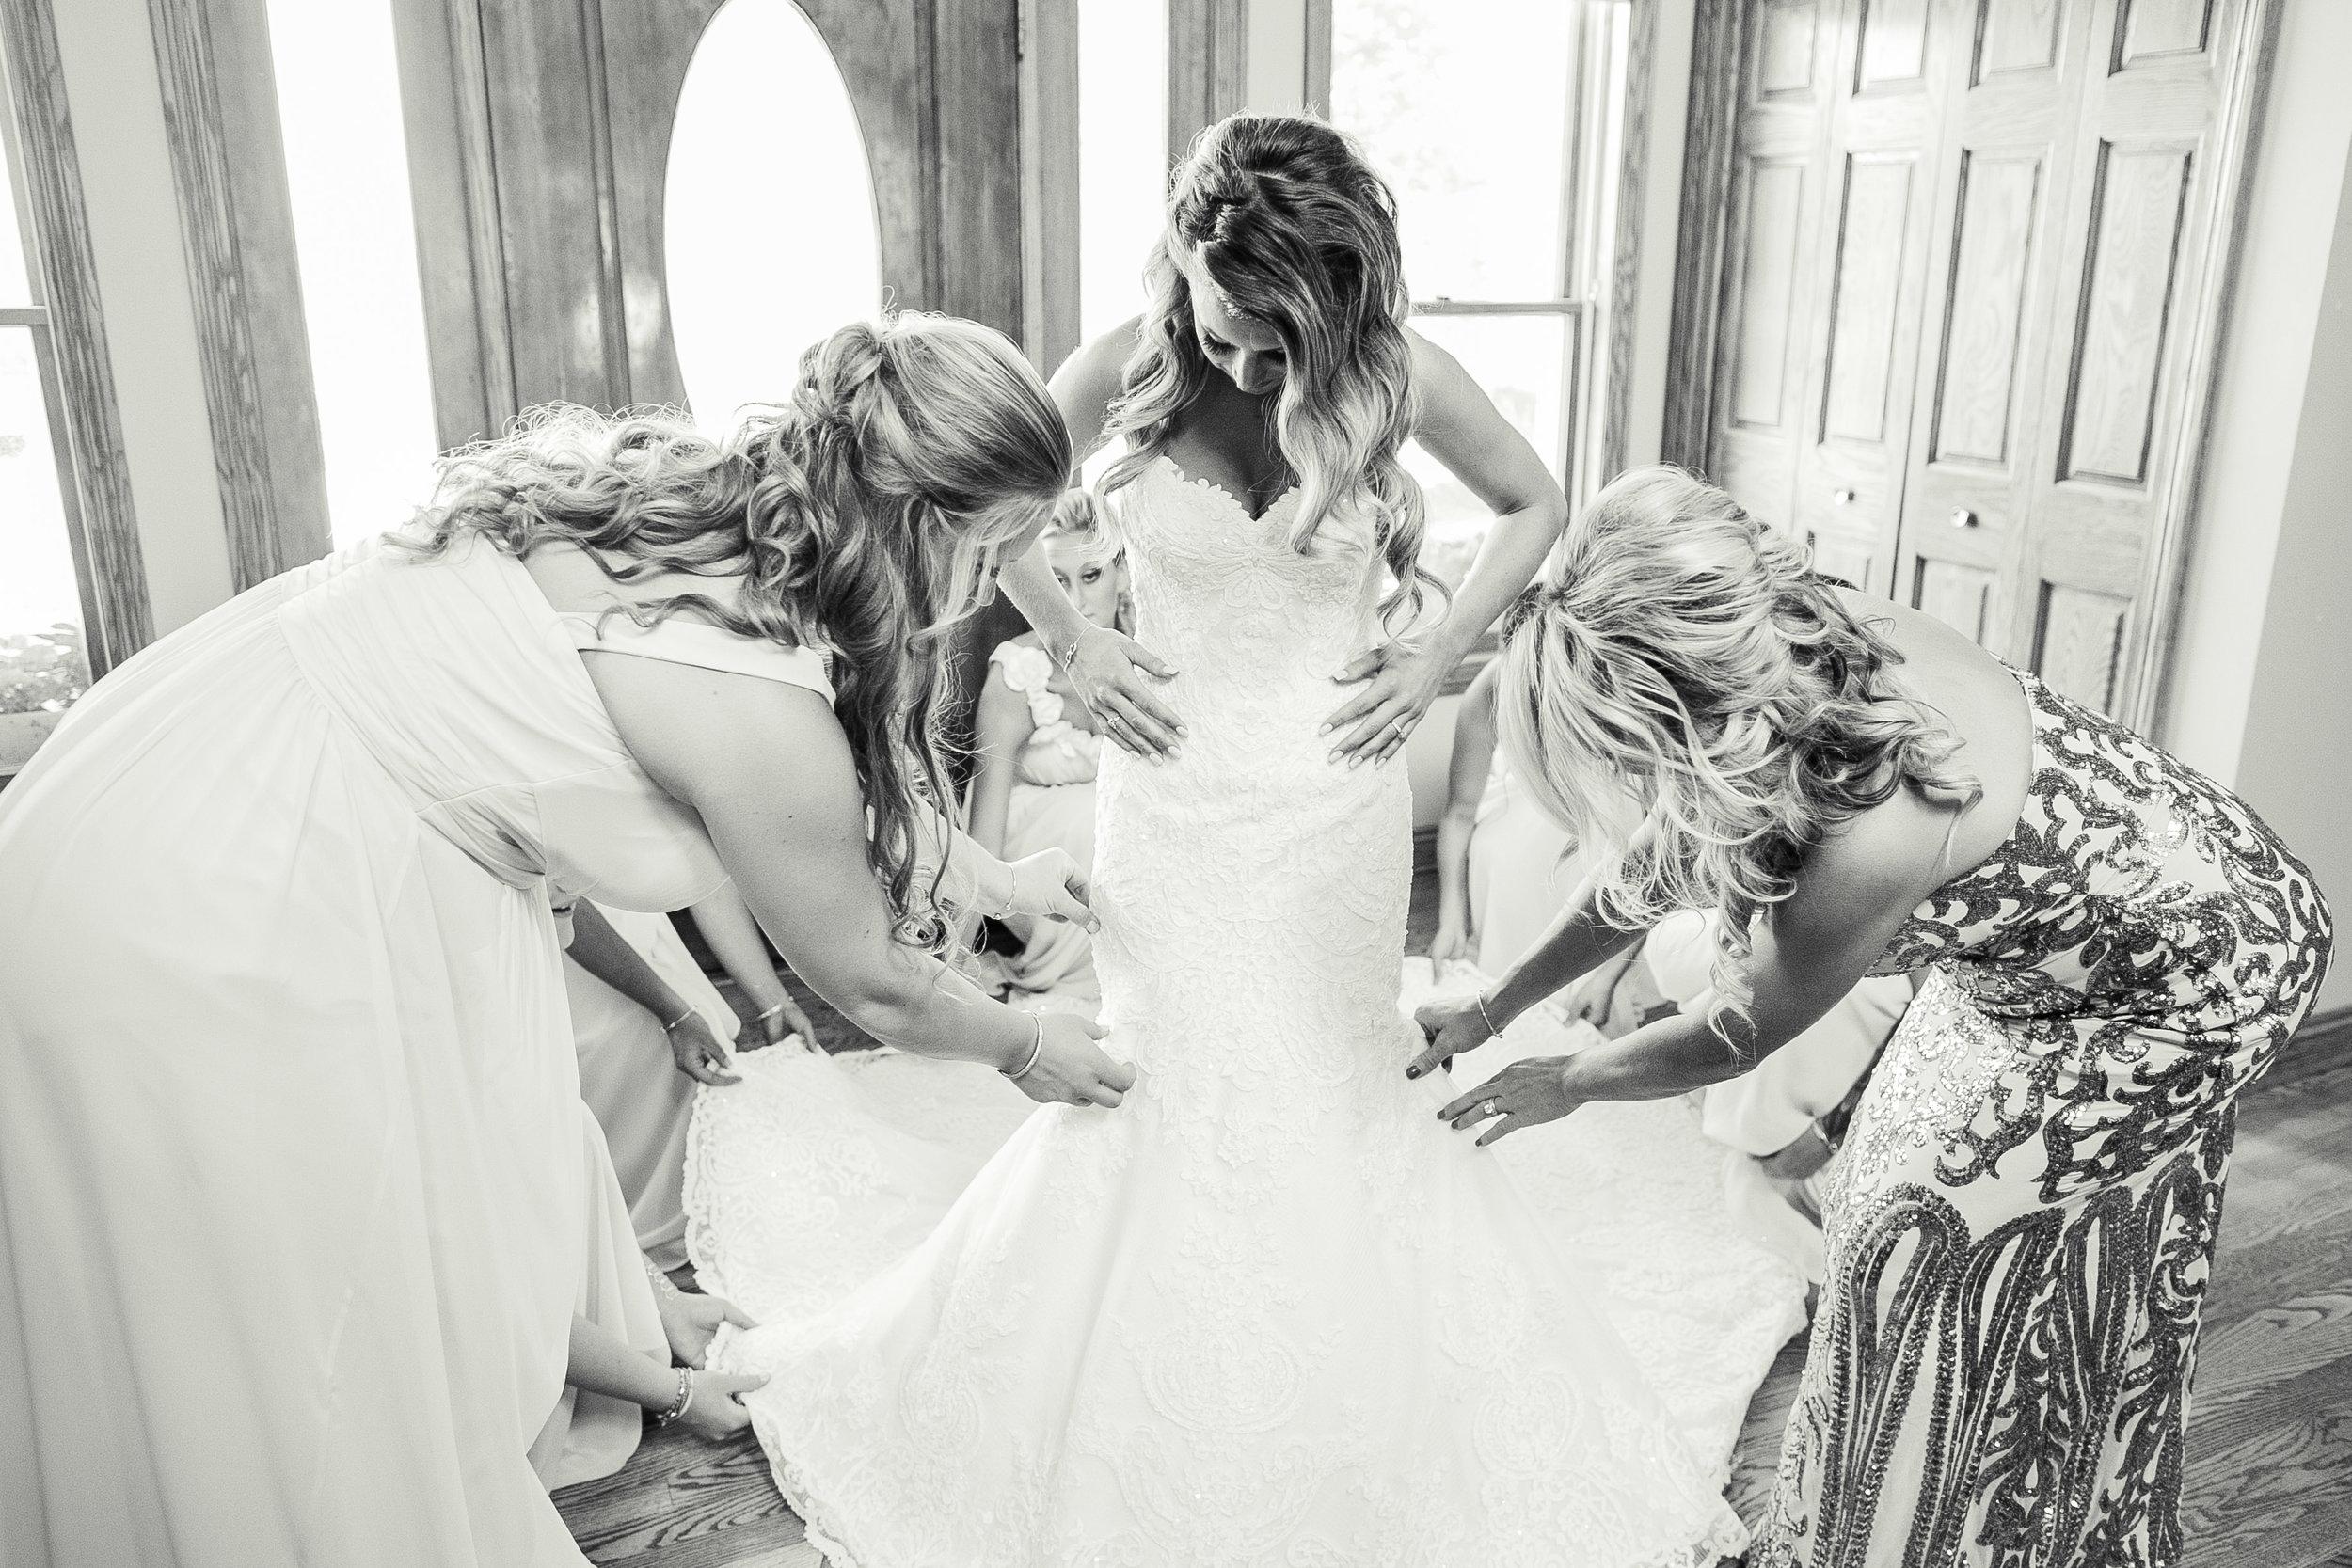 bridesmaids helping bride put dress on